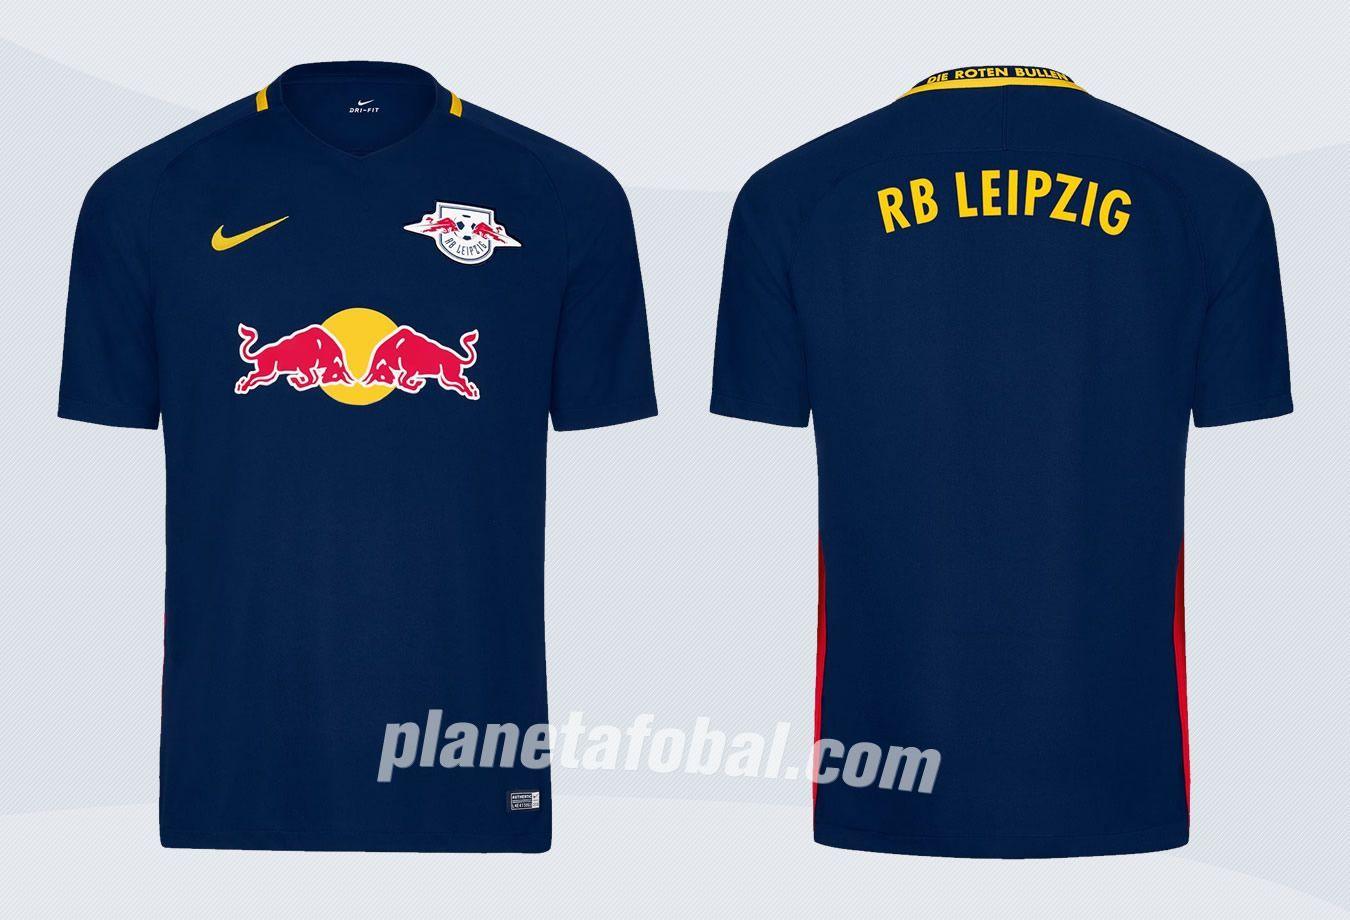 Camiseta suplente del RB Leipzig | Imágenes Web Oficial